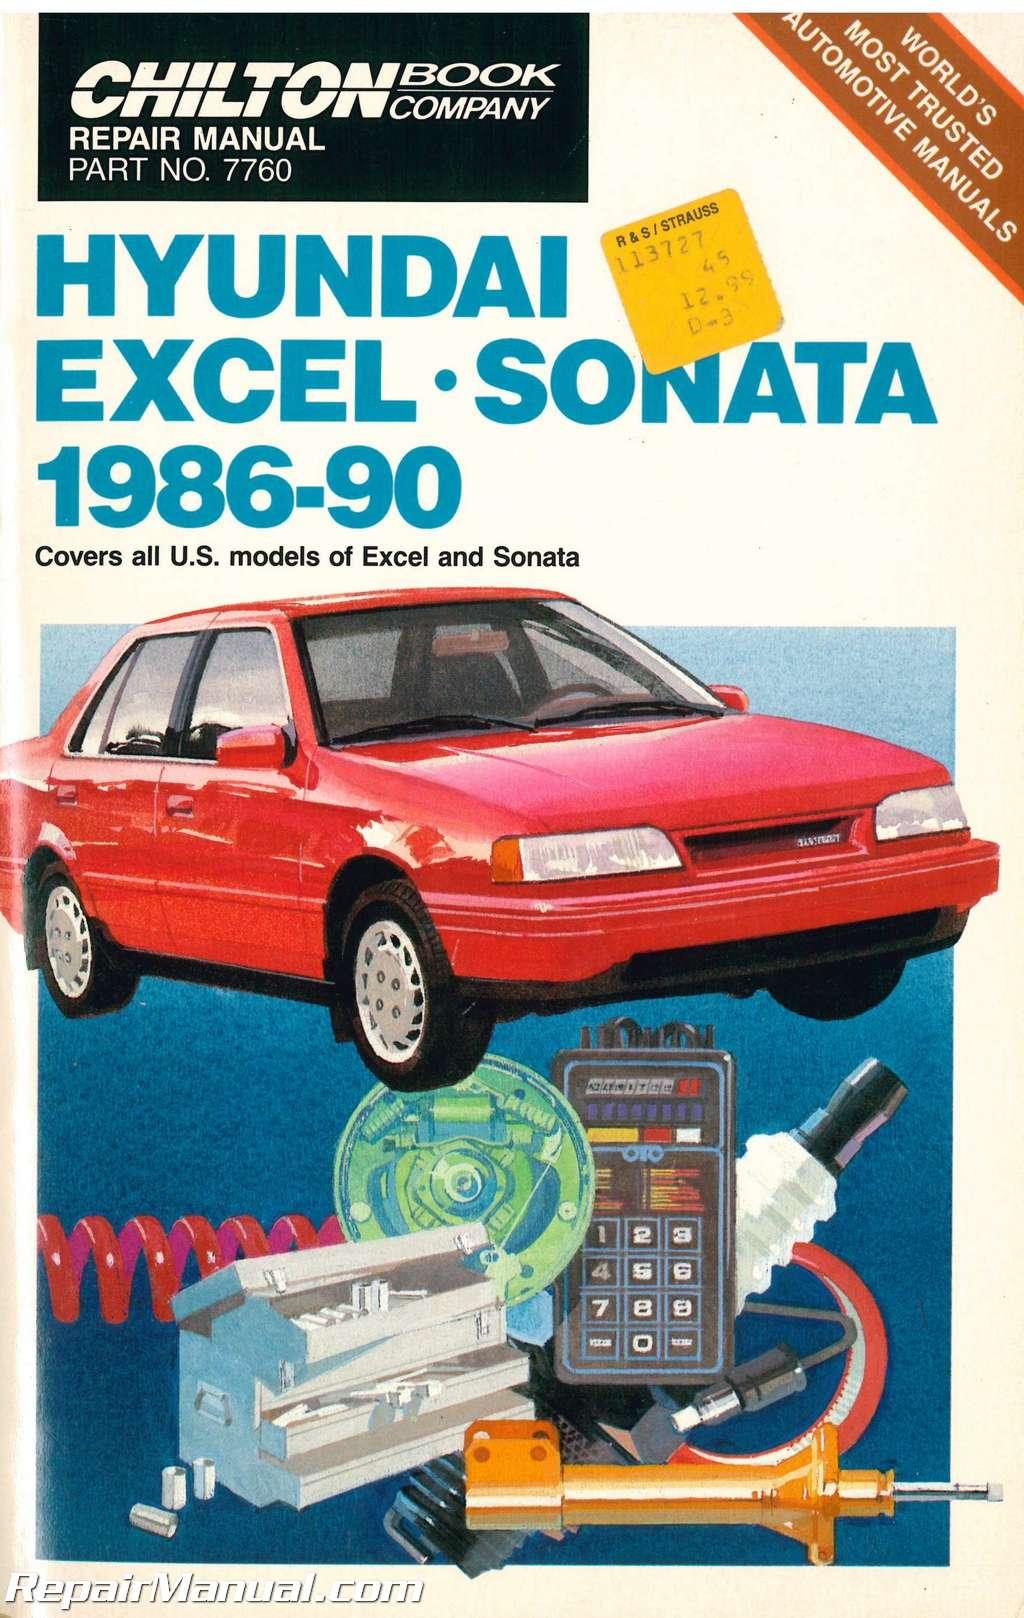 used chilton hyundai elantra excel scoupe sonata 1986 1990 repair rh repairmanual com 1993 Hyundai Scoupe 1995 Hyundai Scoupe